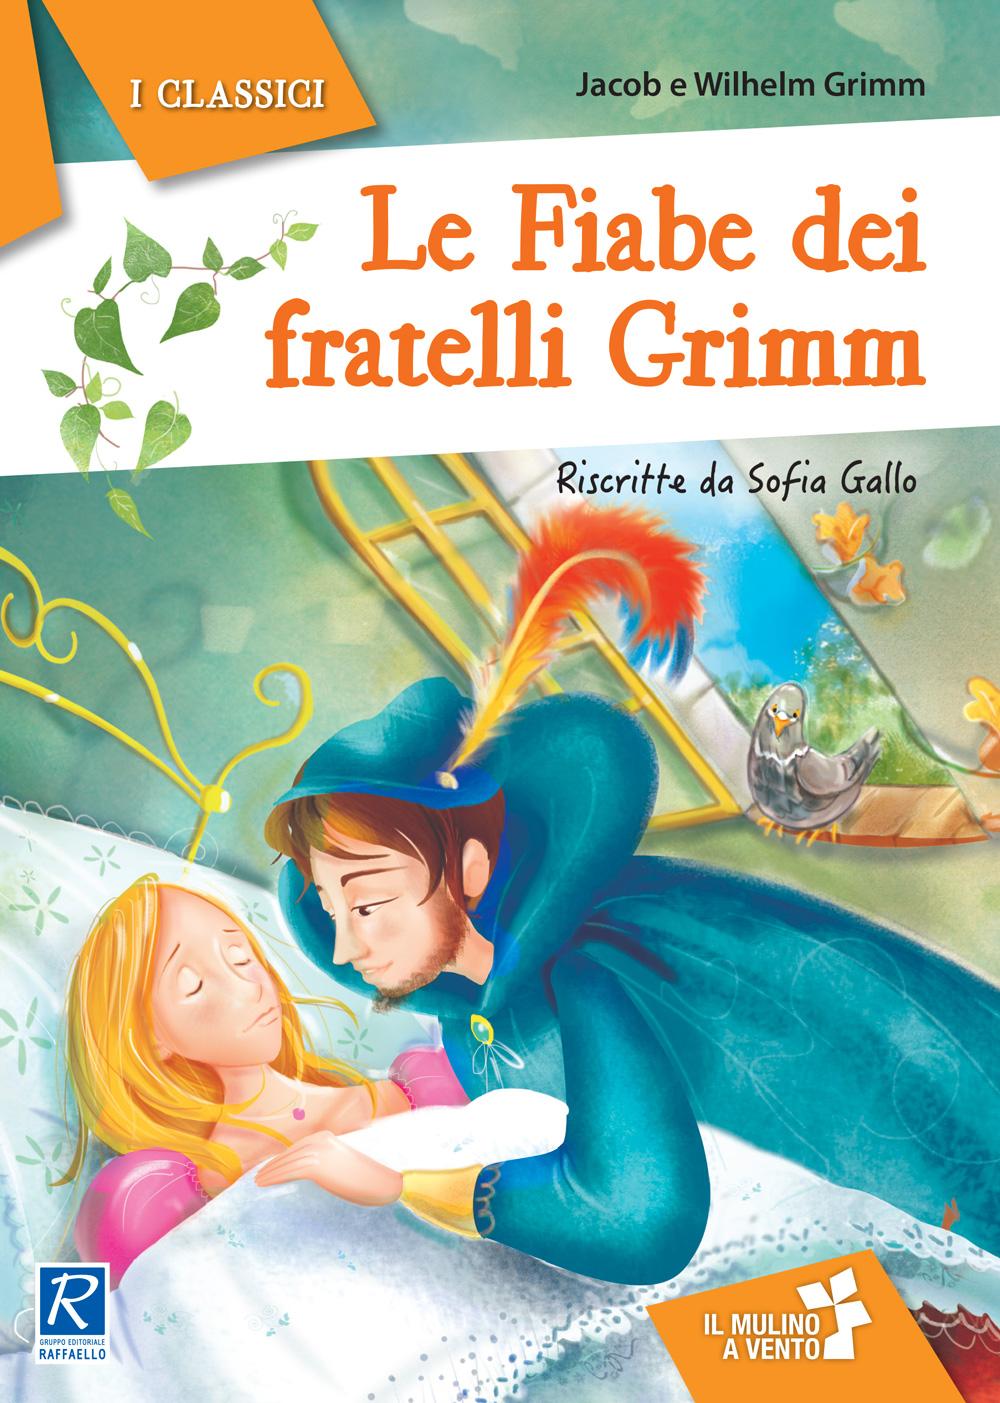 Le fiabe dei fratelli Grimm